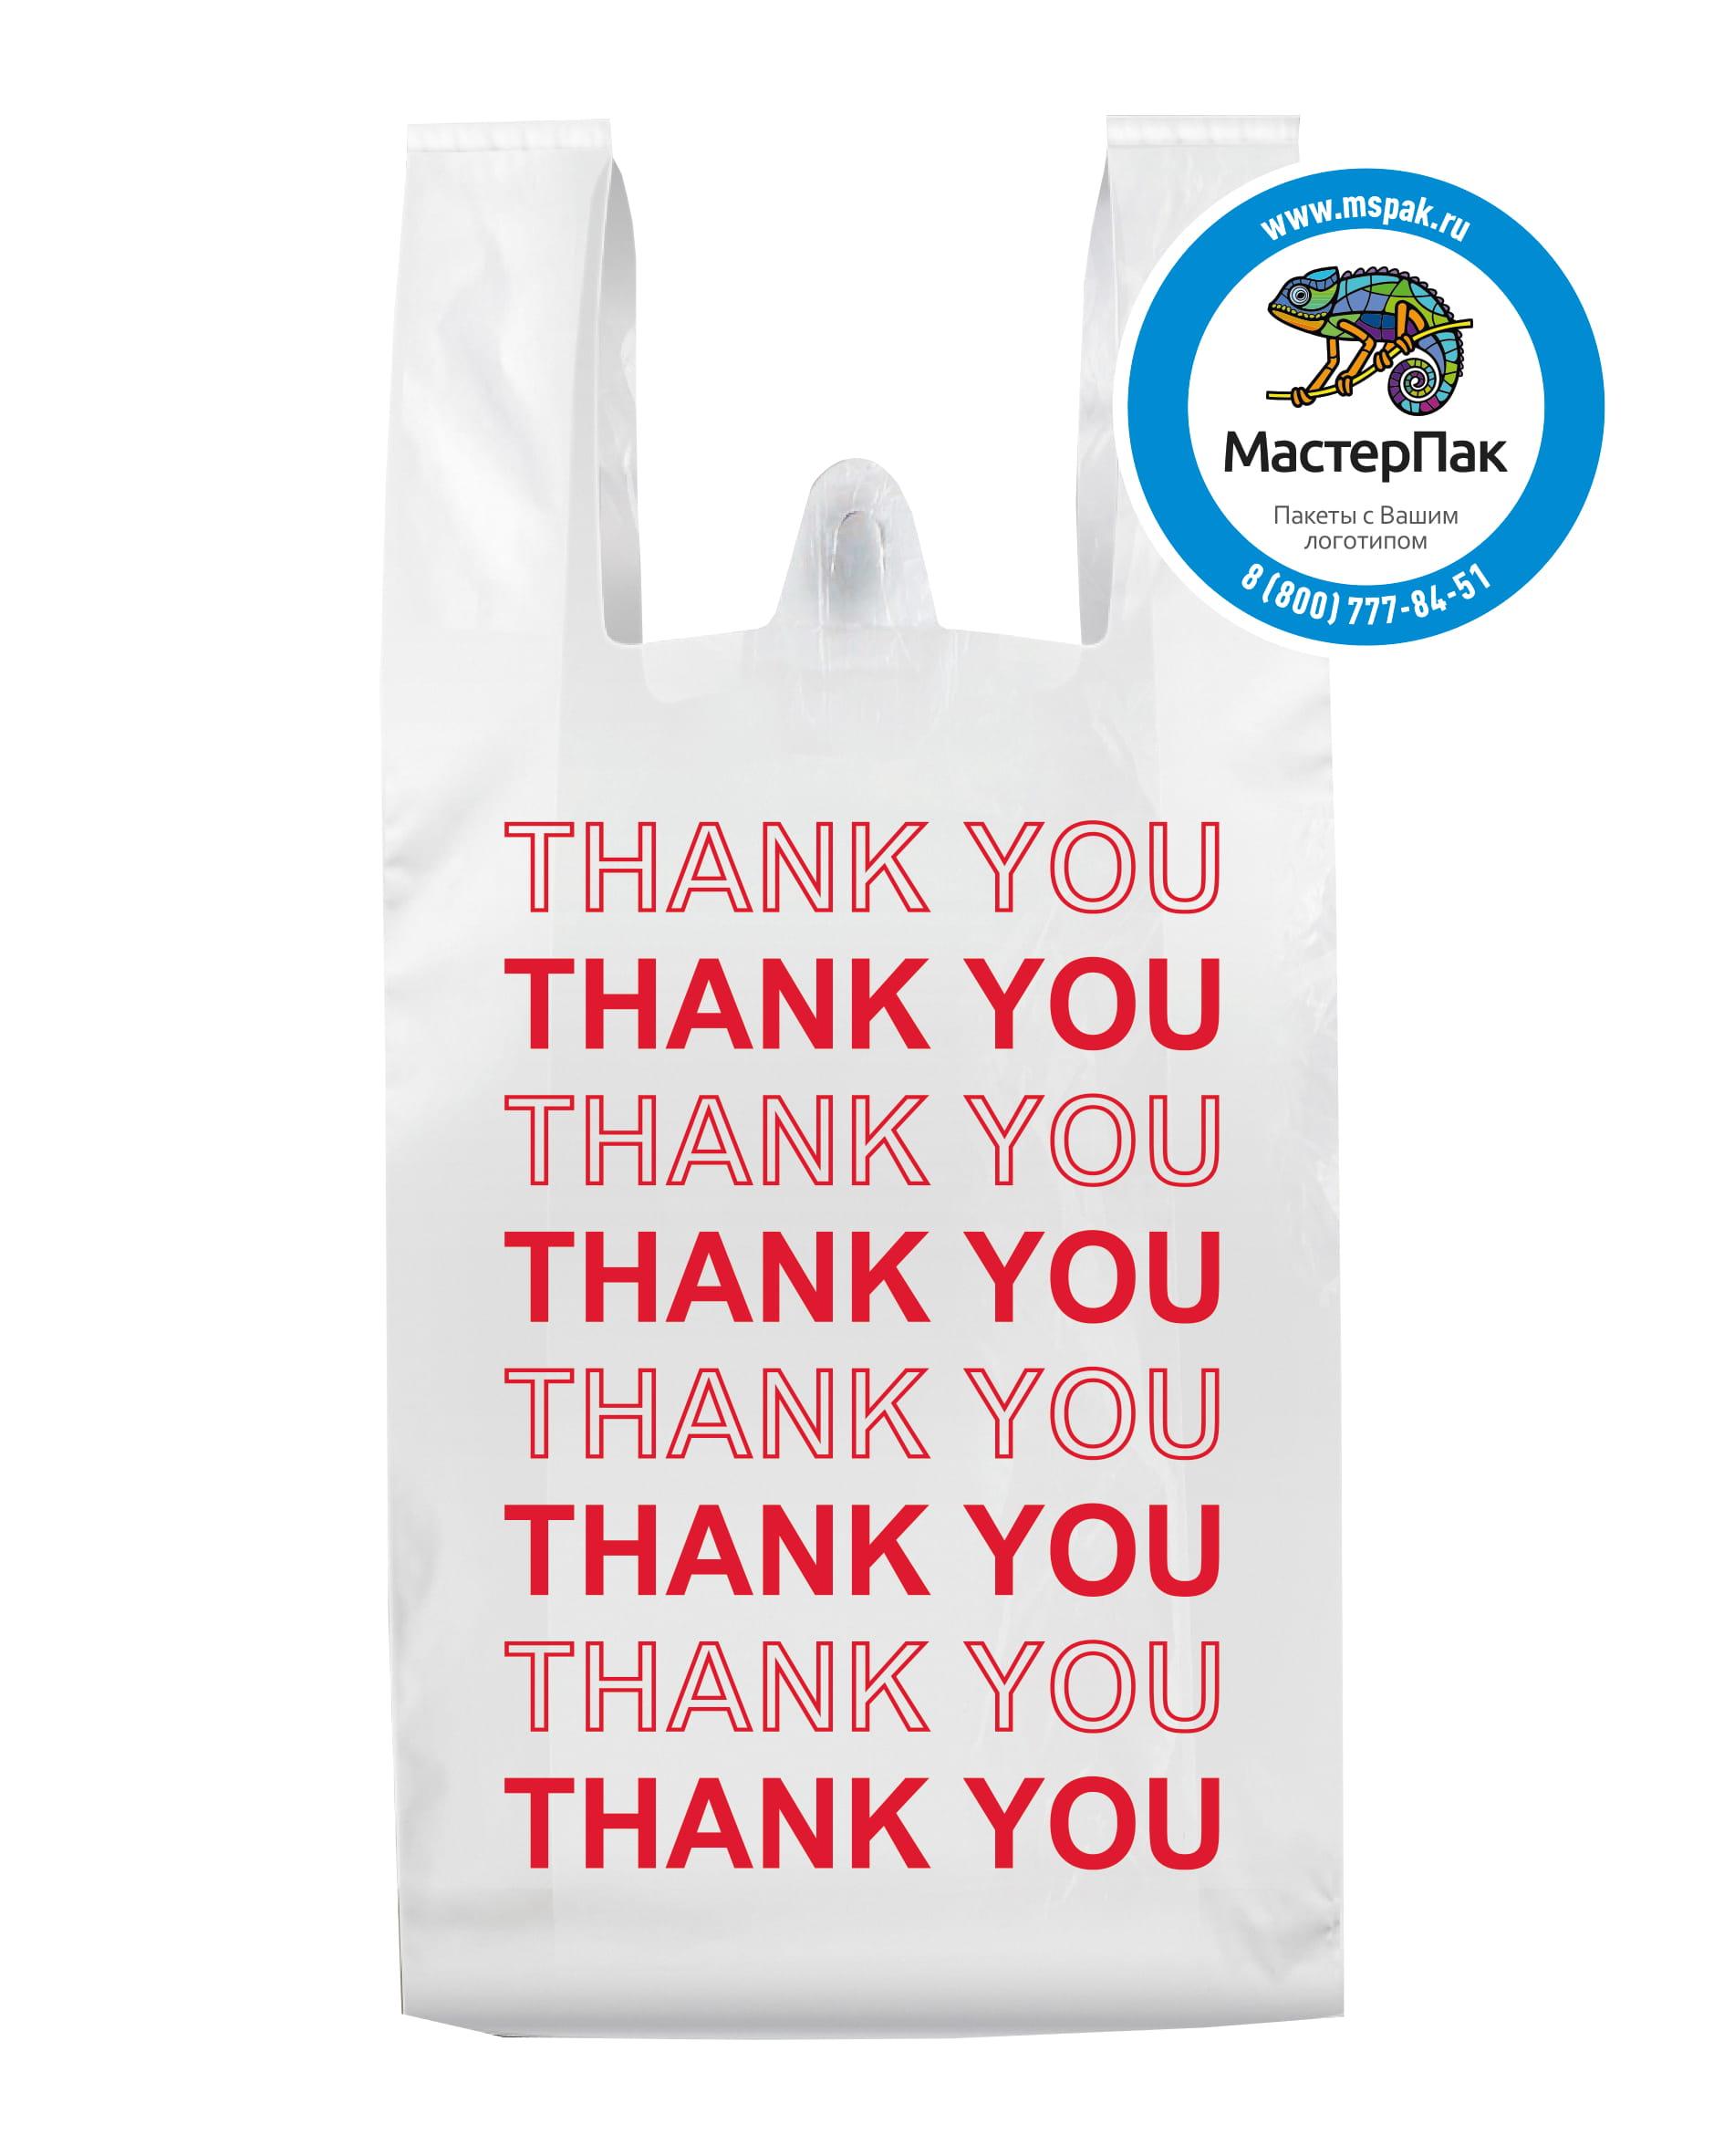 Пакет-майка ПВД с логотипом Thank you, Сургут, 30 мкм, 40*60